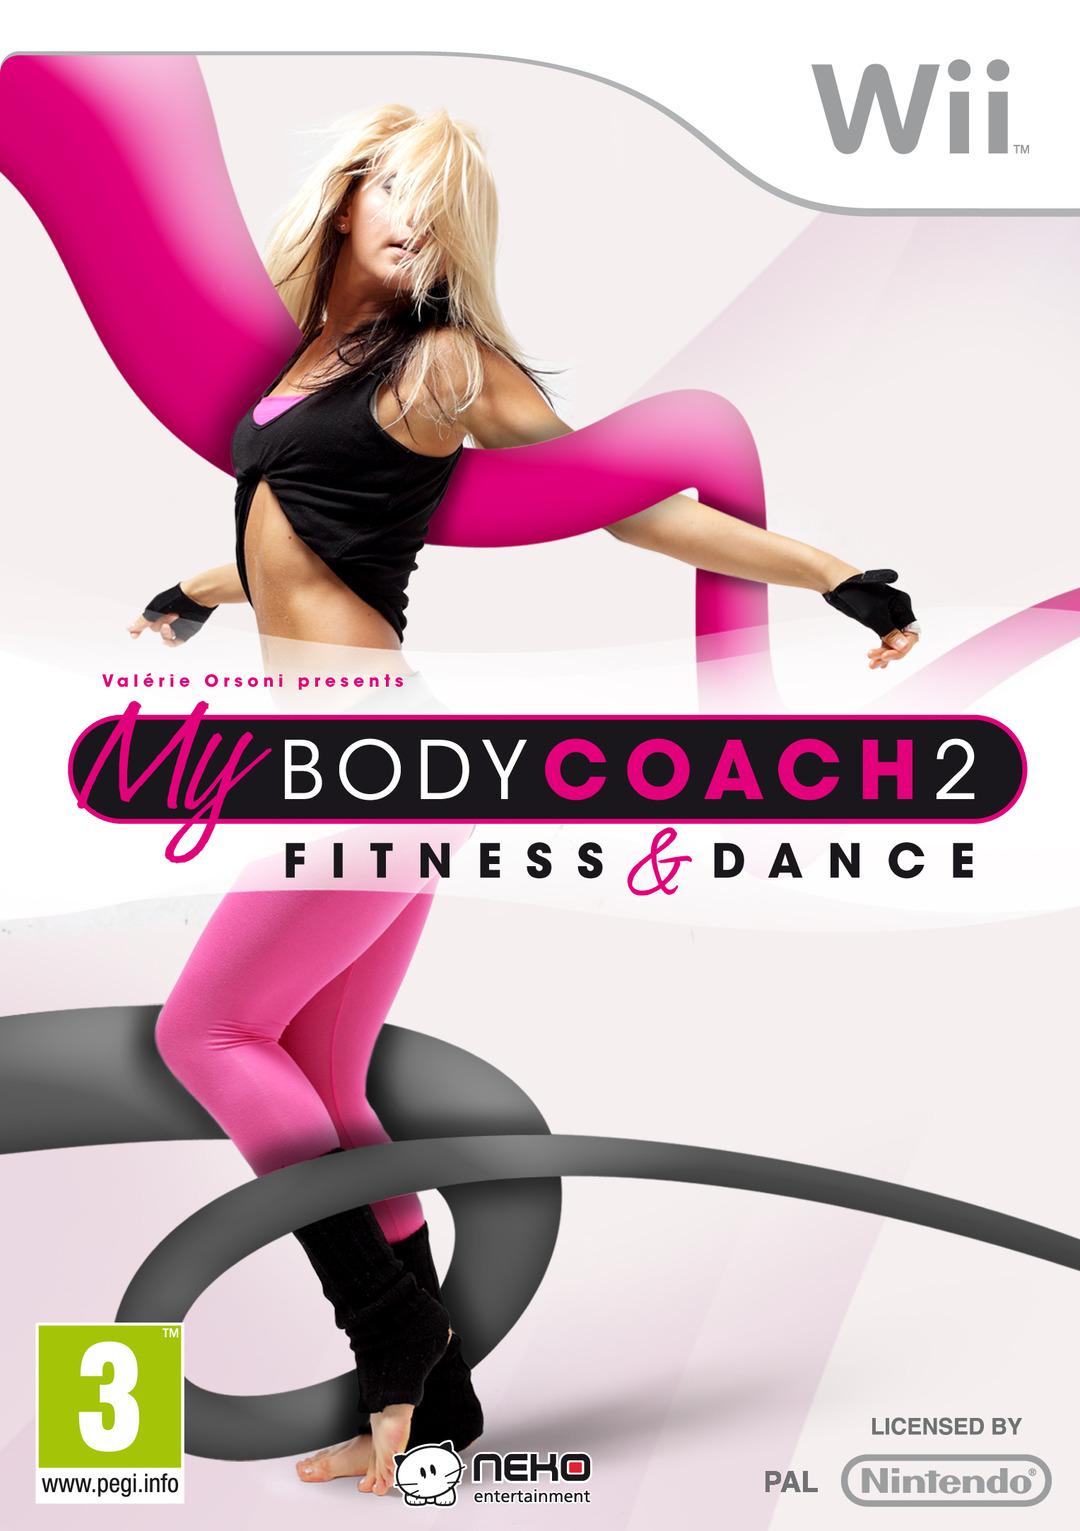 My Body Coach 2